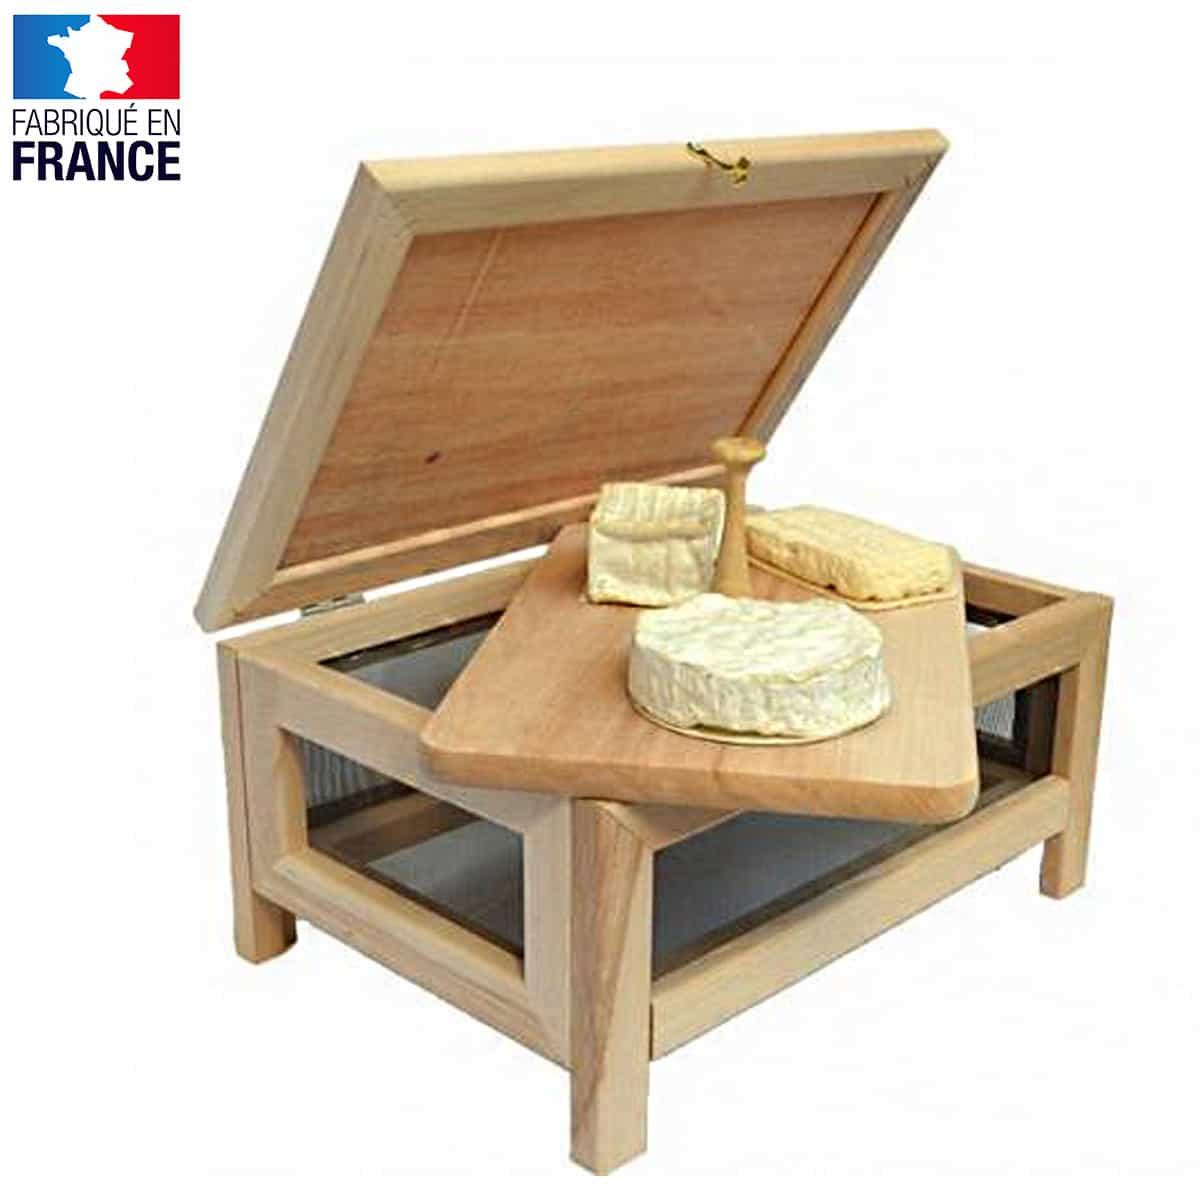 cave fromage avec plateau accessoire ustensile cuisine. Black Bedroom Furniture Sets. Home Design Ideas